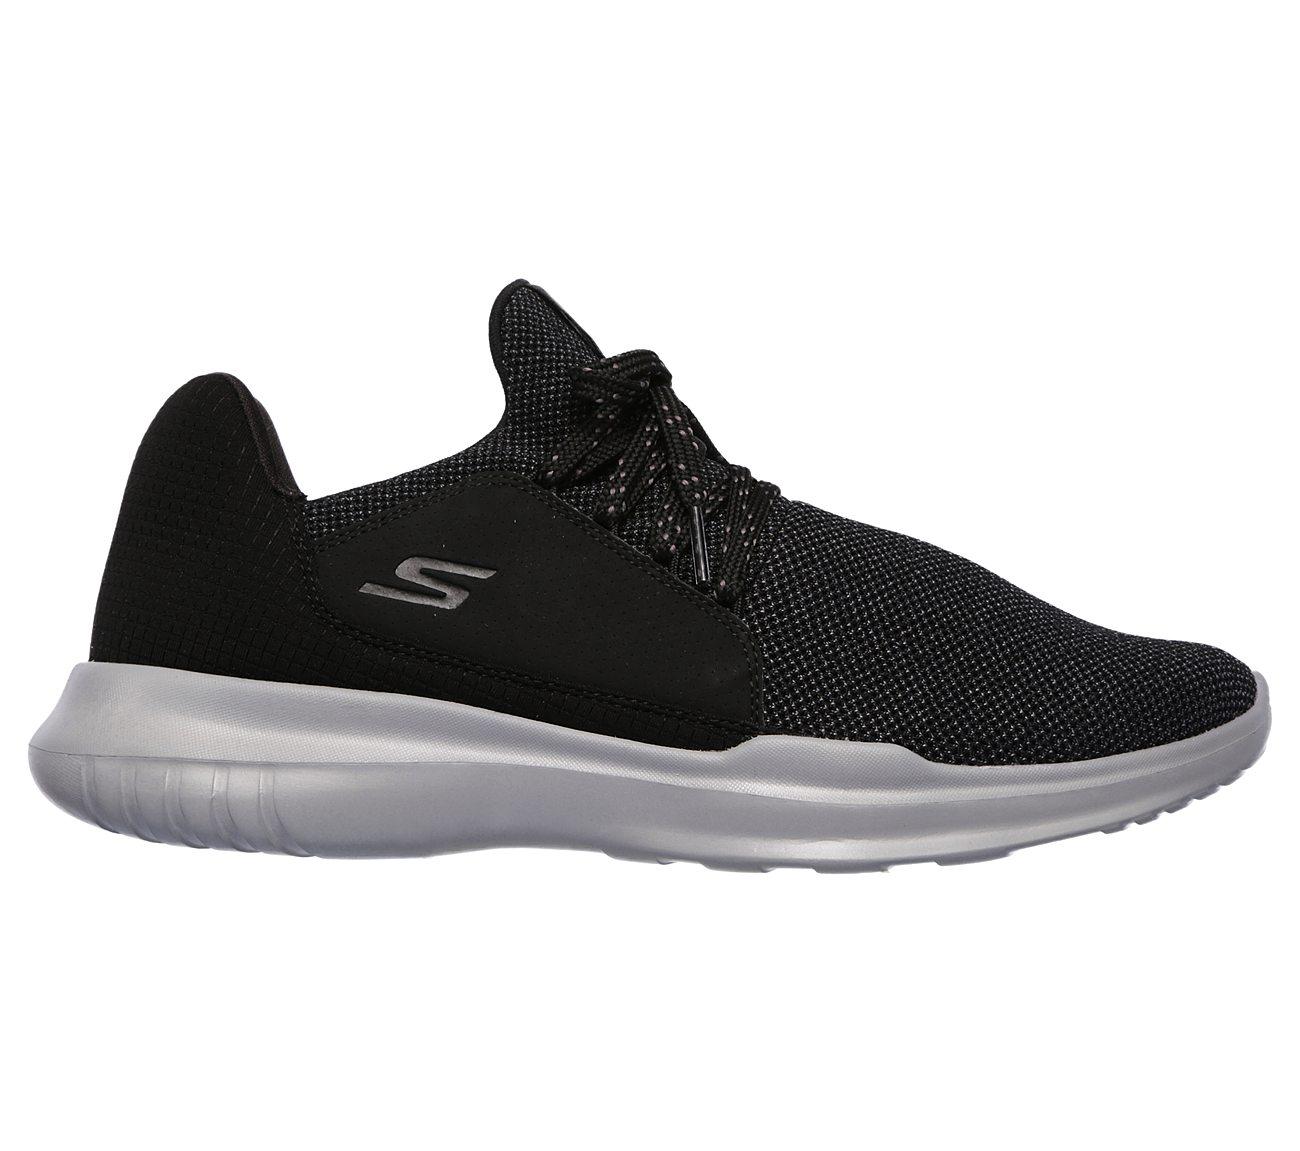 Skechers Women's Go Run Mojo Verve Slip On Sneaker